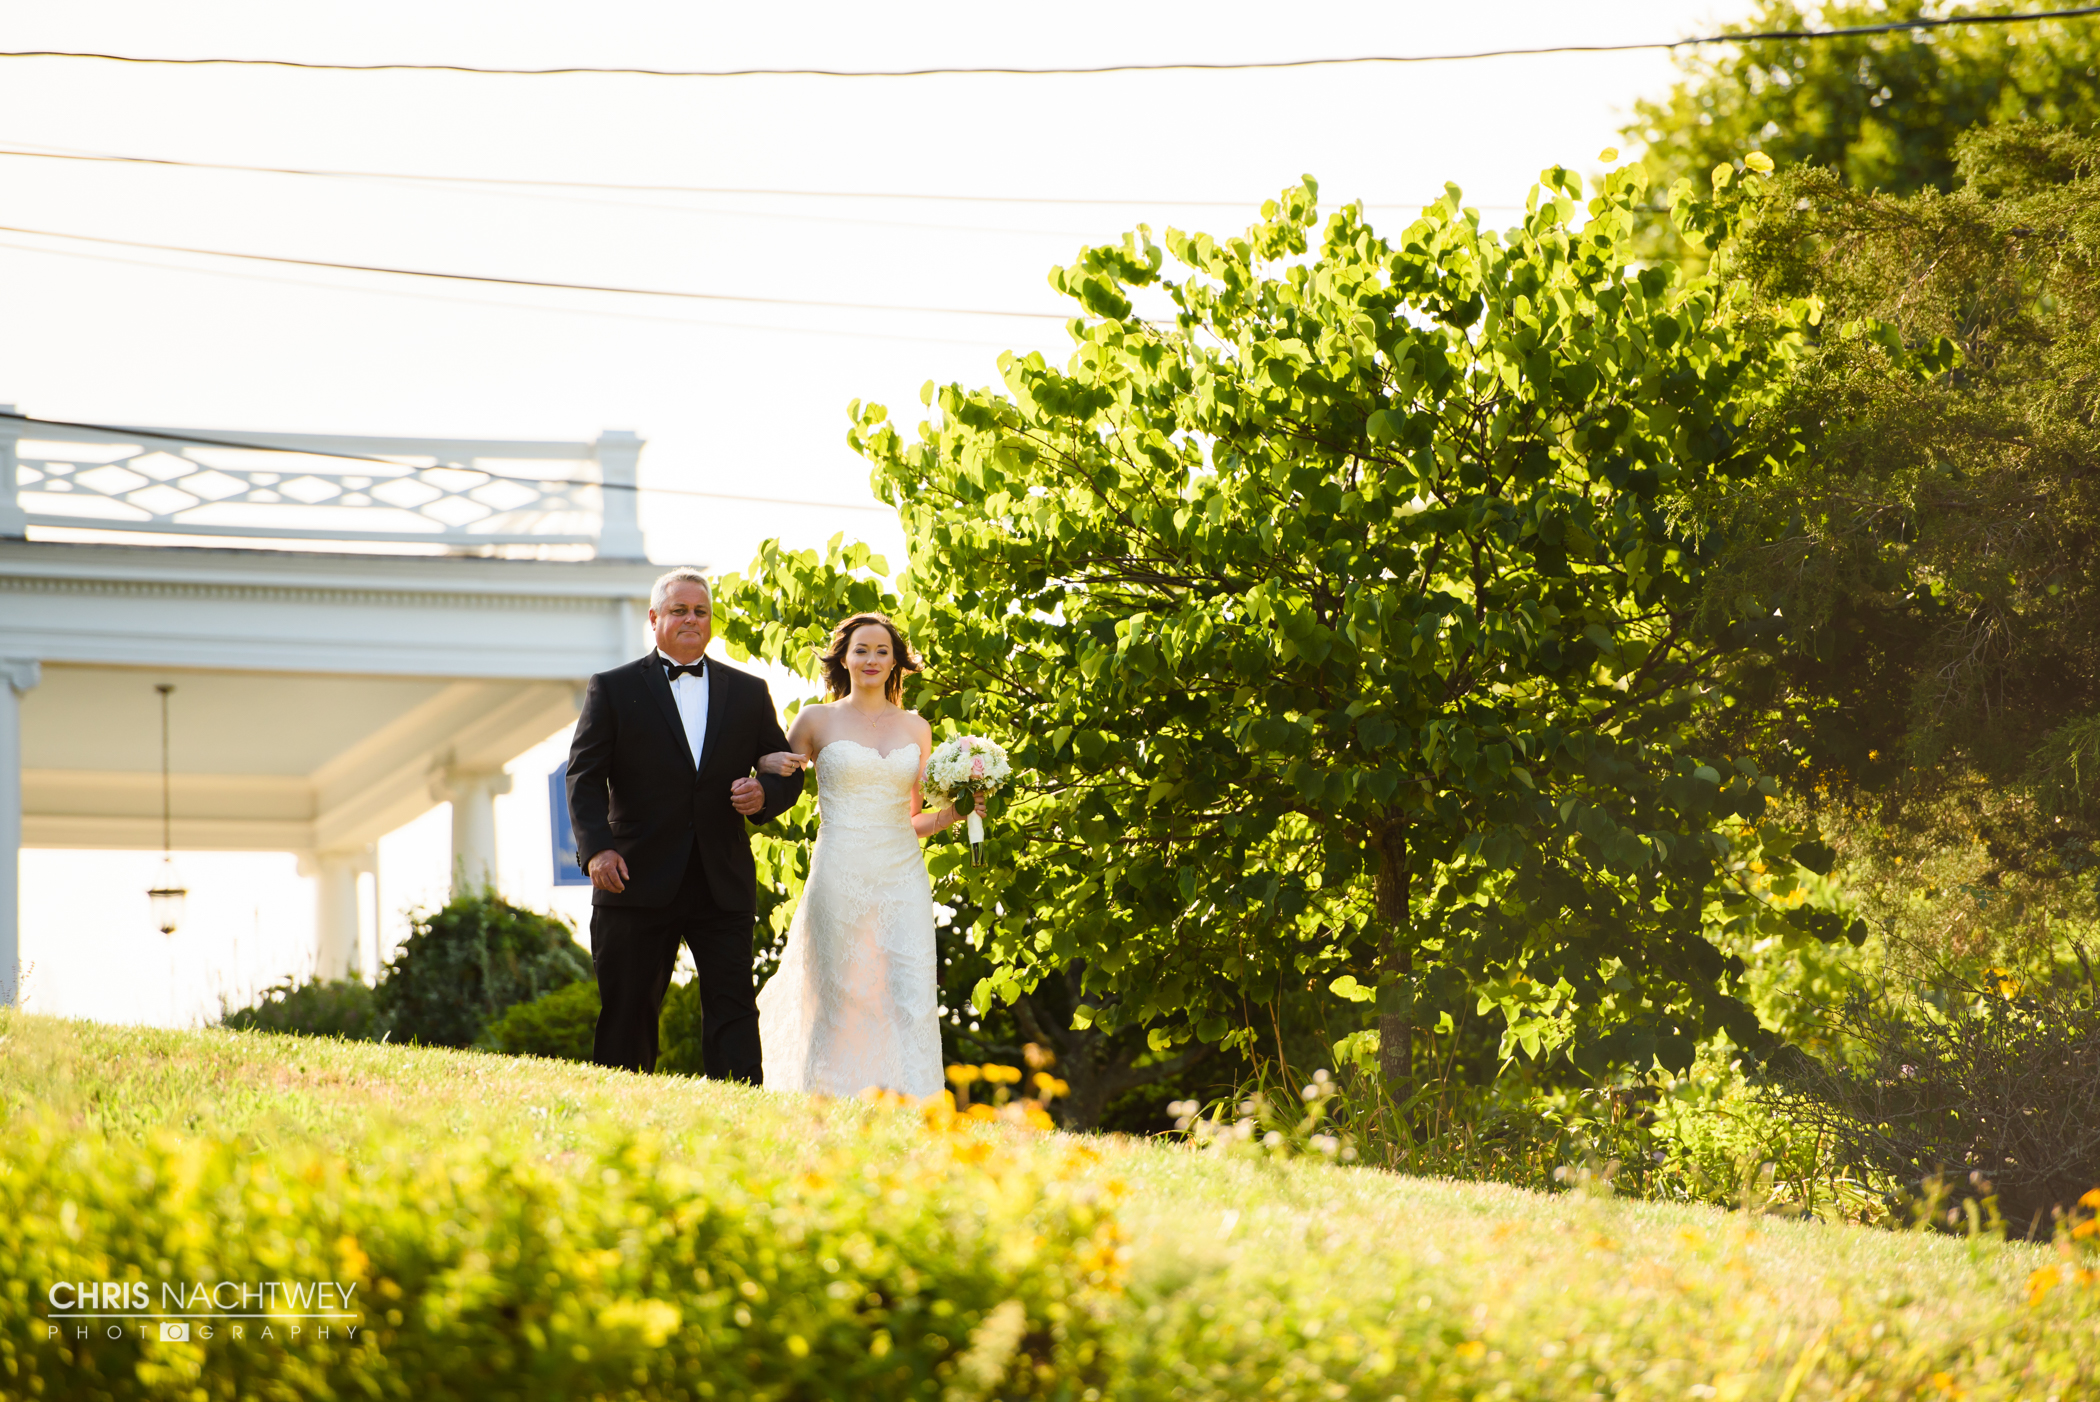 inn-at-mystic-connecticut-wedding-photographer-chris-nachtwey-13.jpg